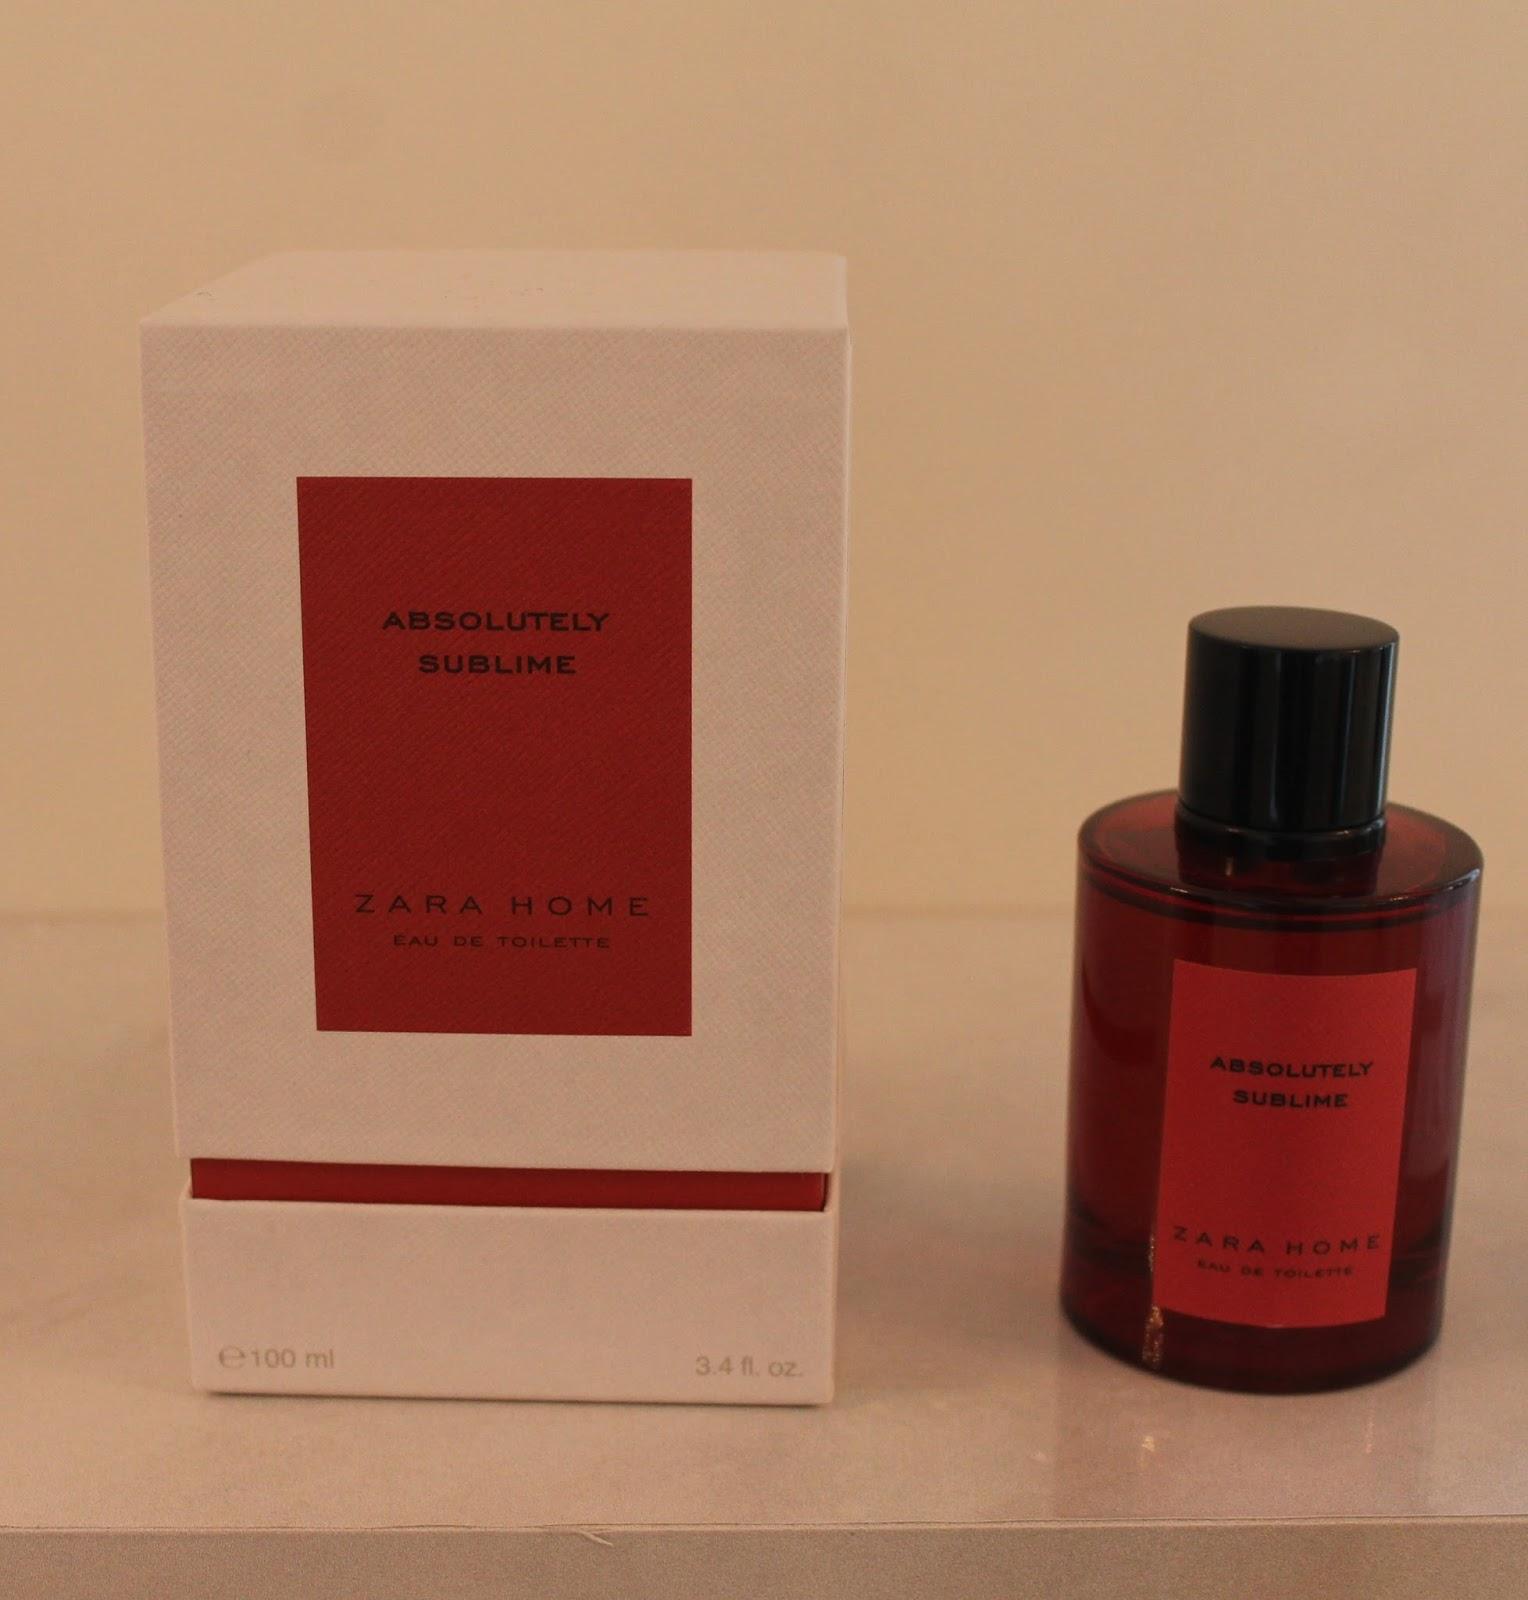 Zara Home Personal Fragrances Launch